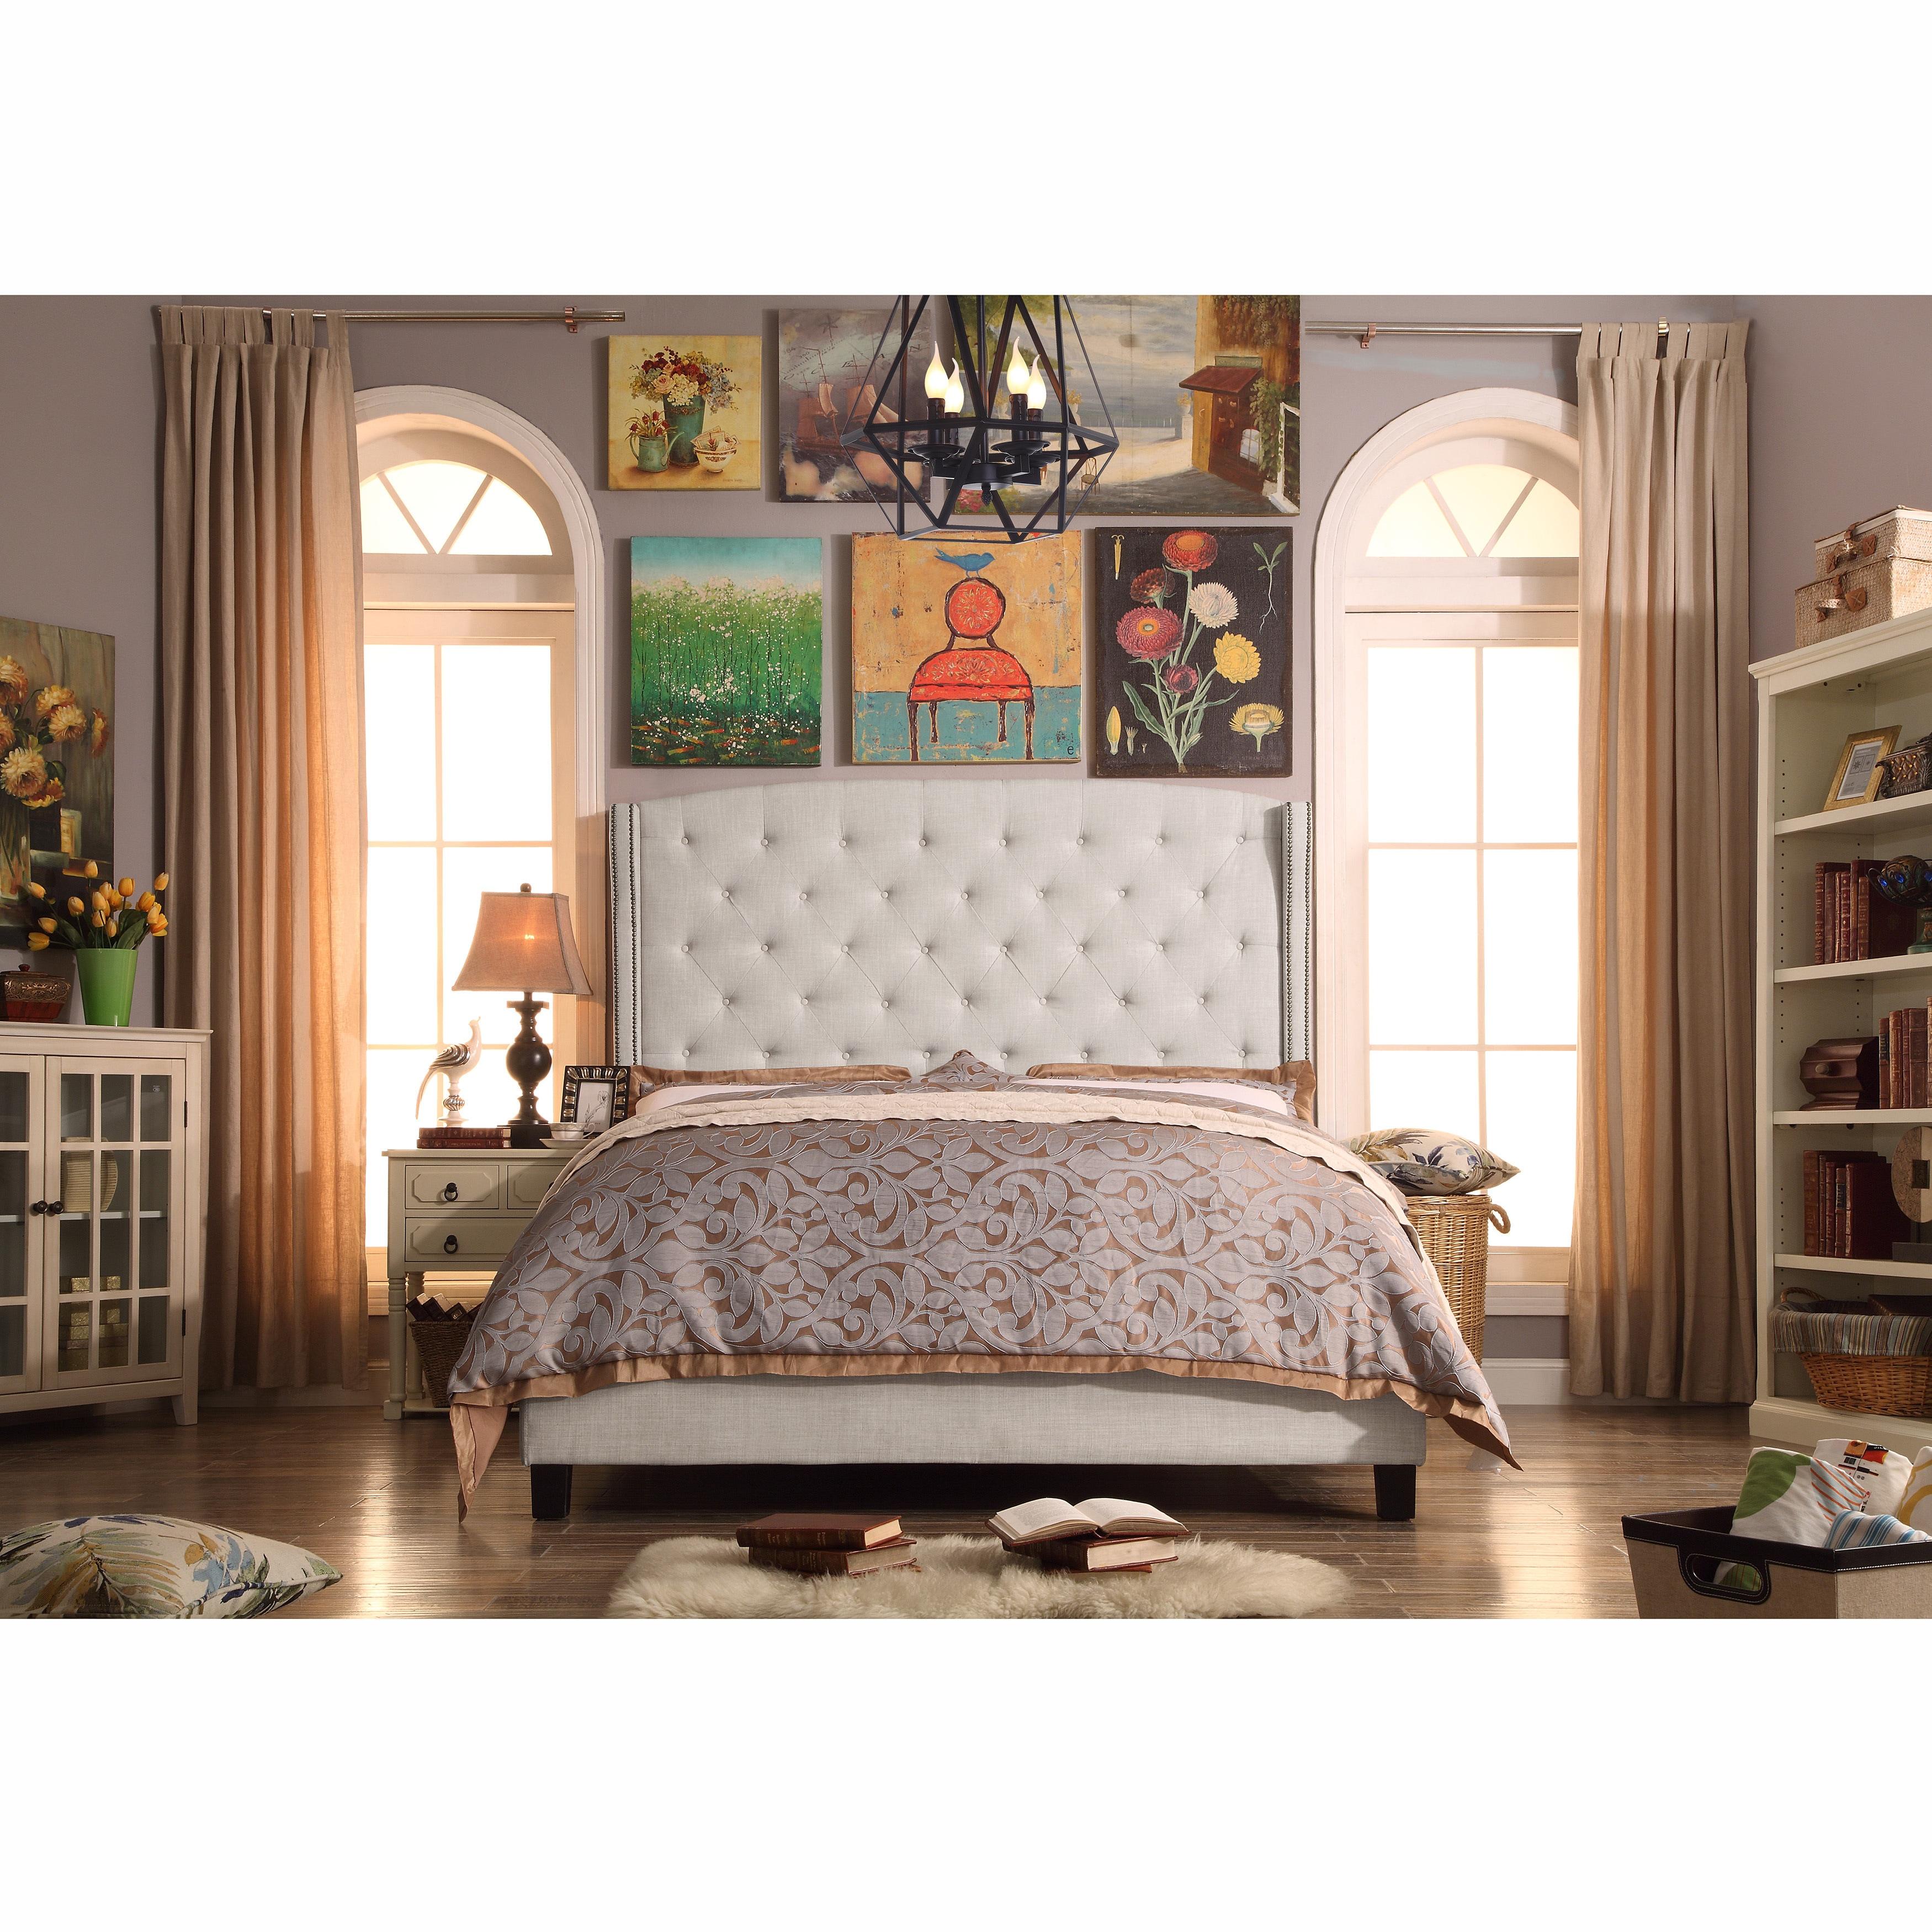 Moser Bay Full Size Tufted Wingback Upholstered Bed Set (...